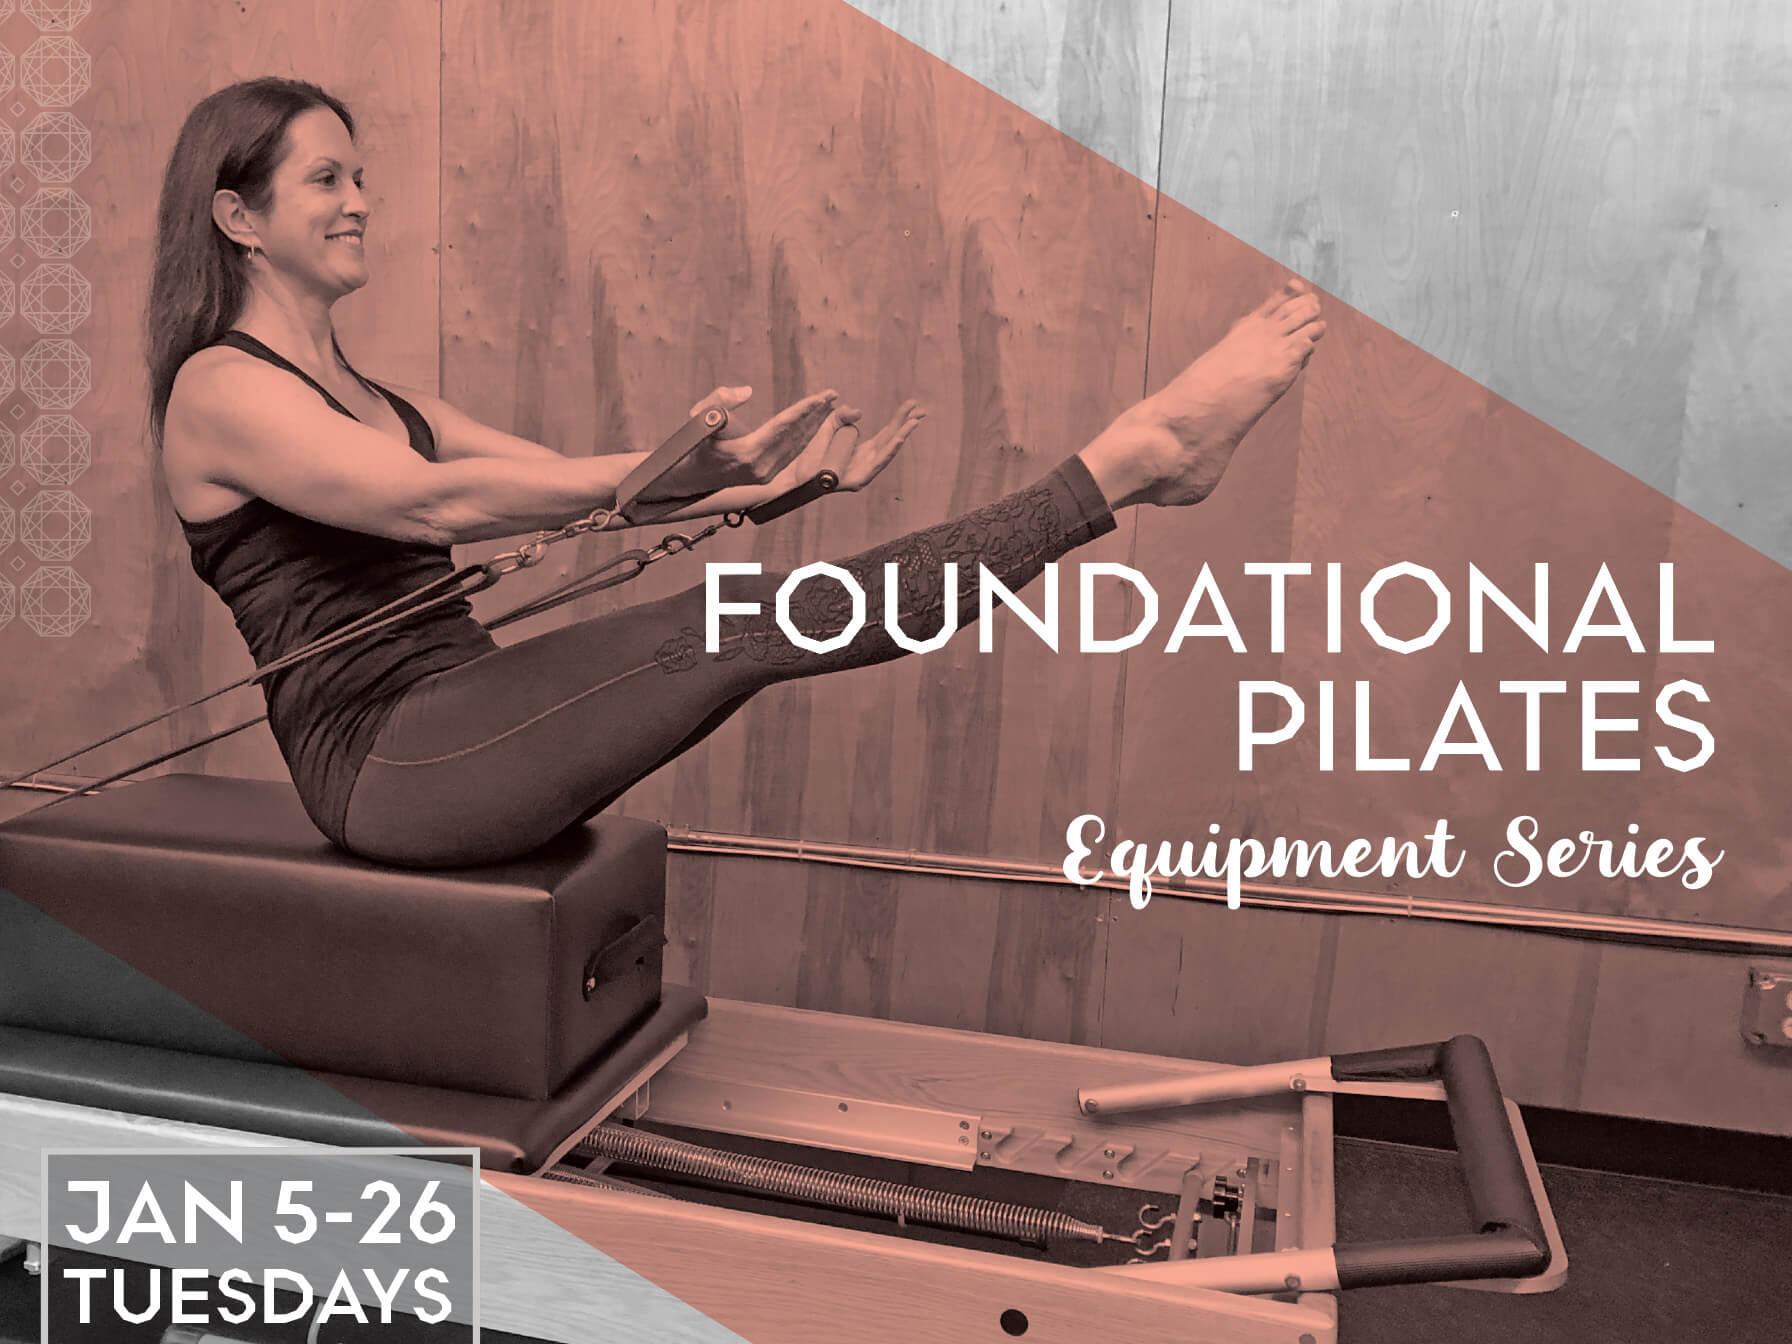 Foundational Pilates: Equipment Series